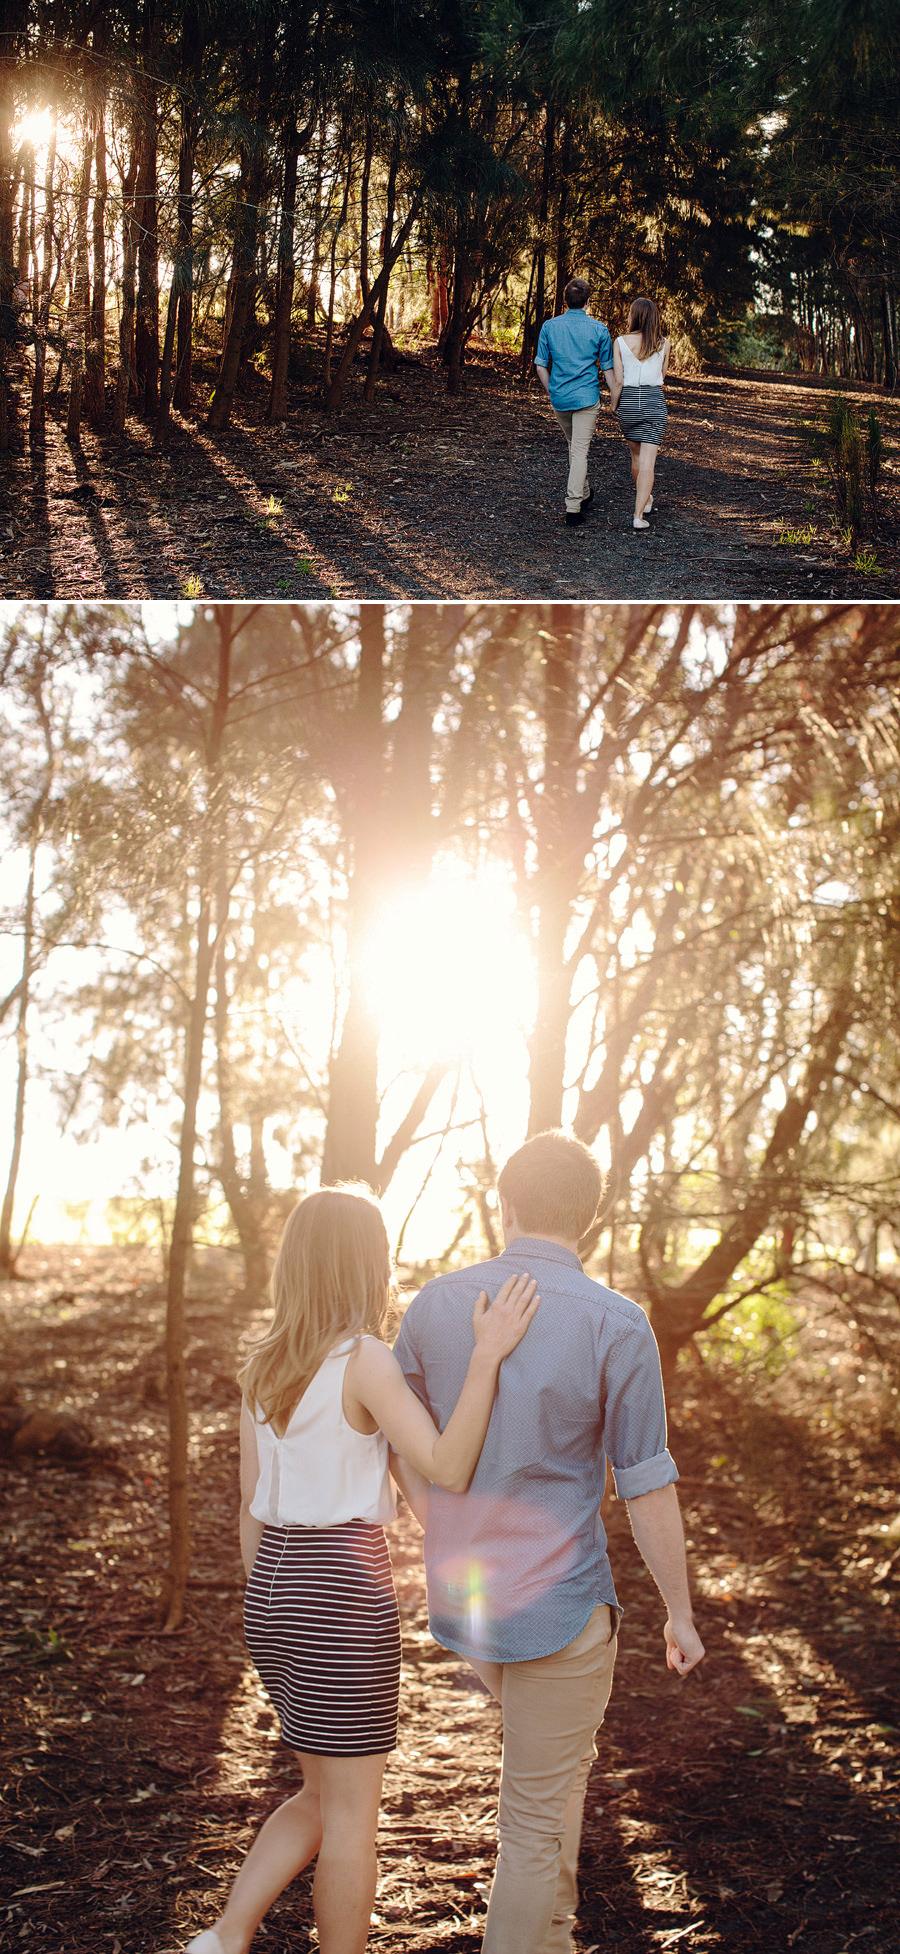 Sydney Park Engagement Photography: Kristyn & Shaun